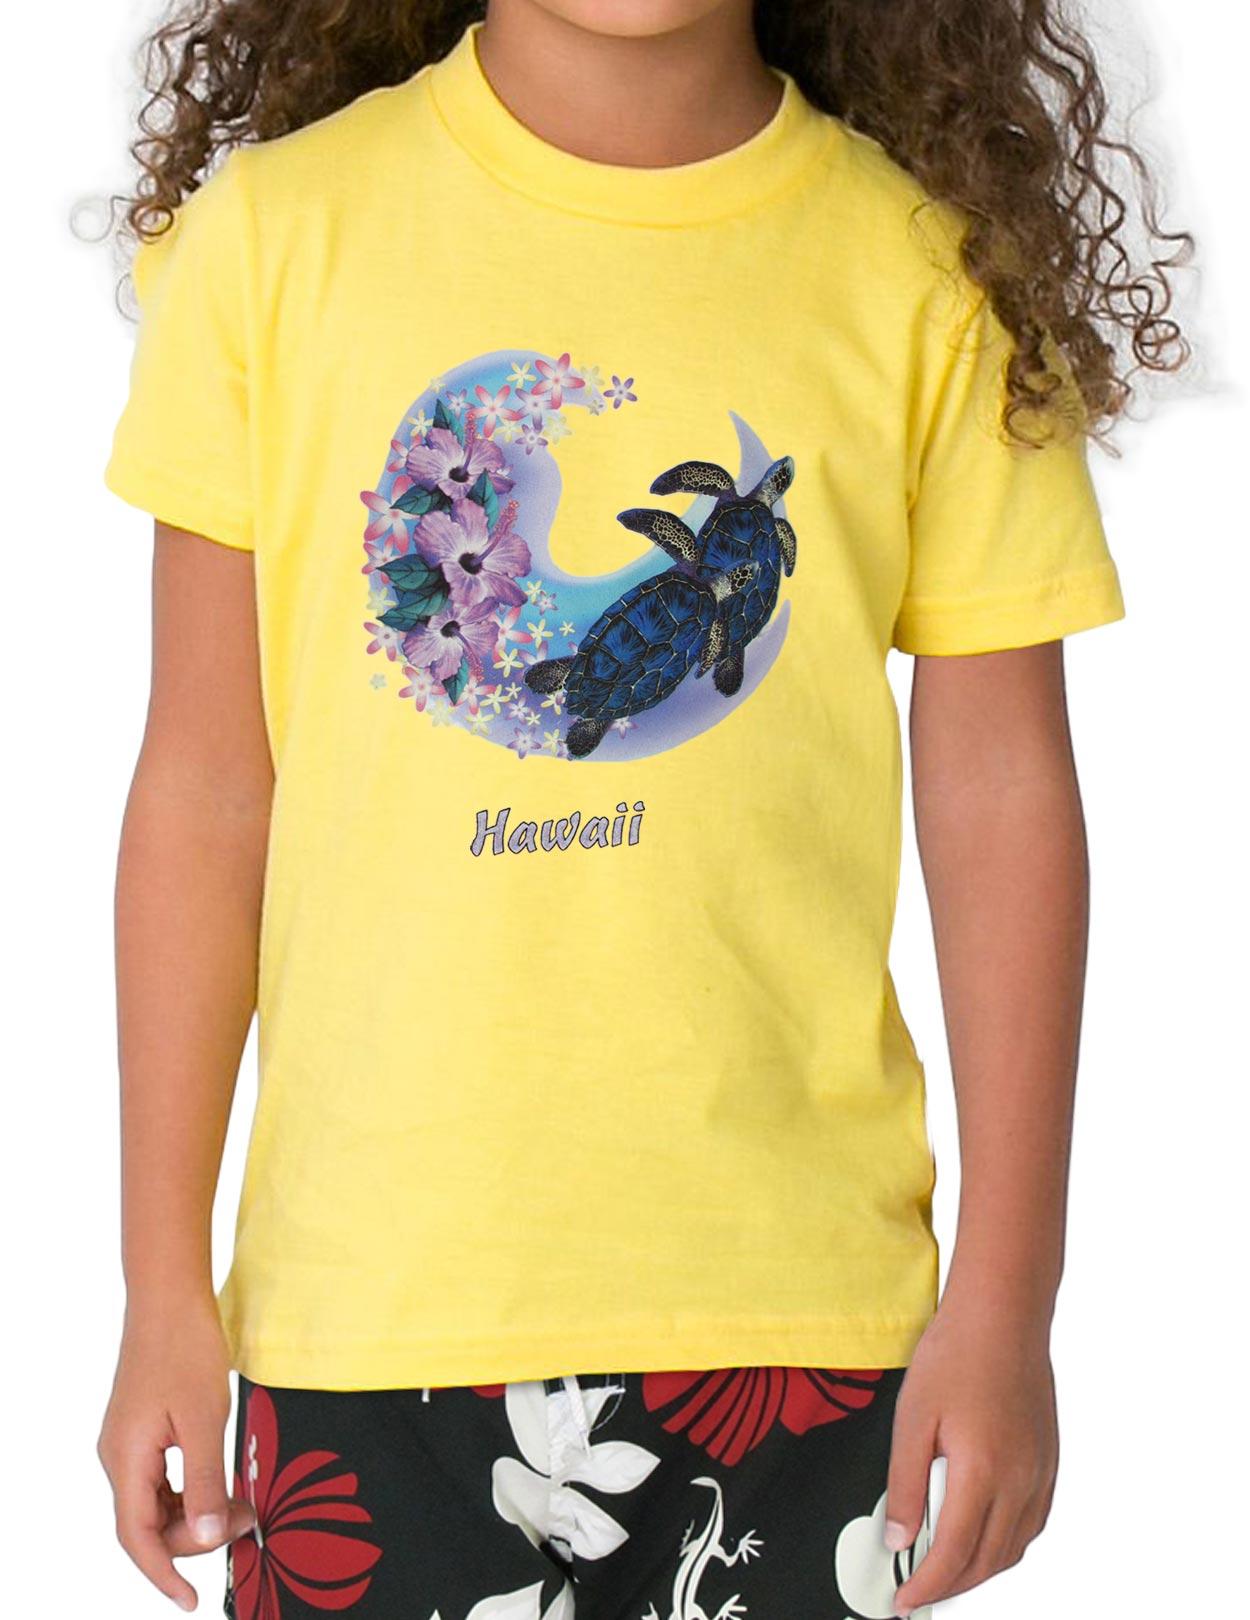 Aloha Shirts For Women